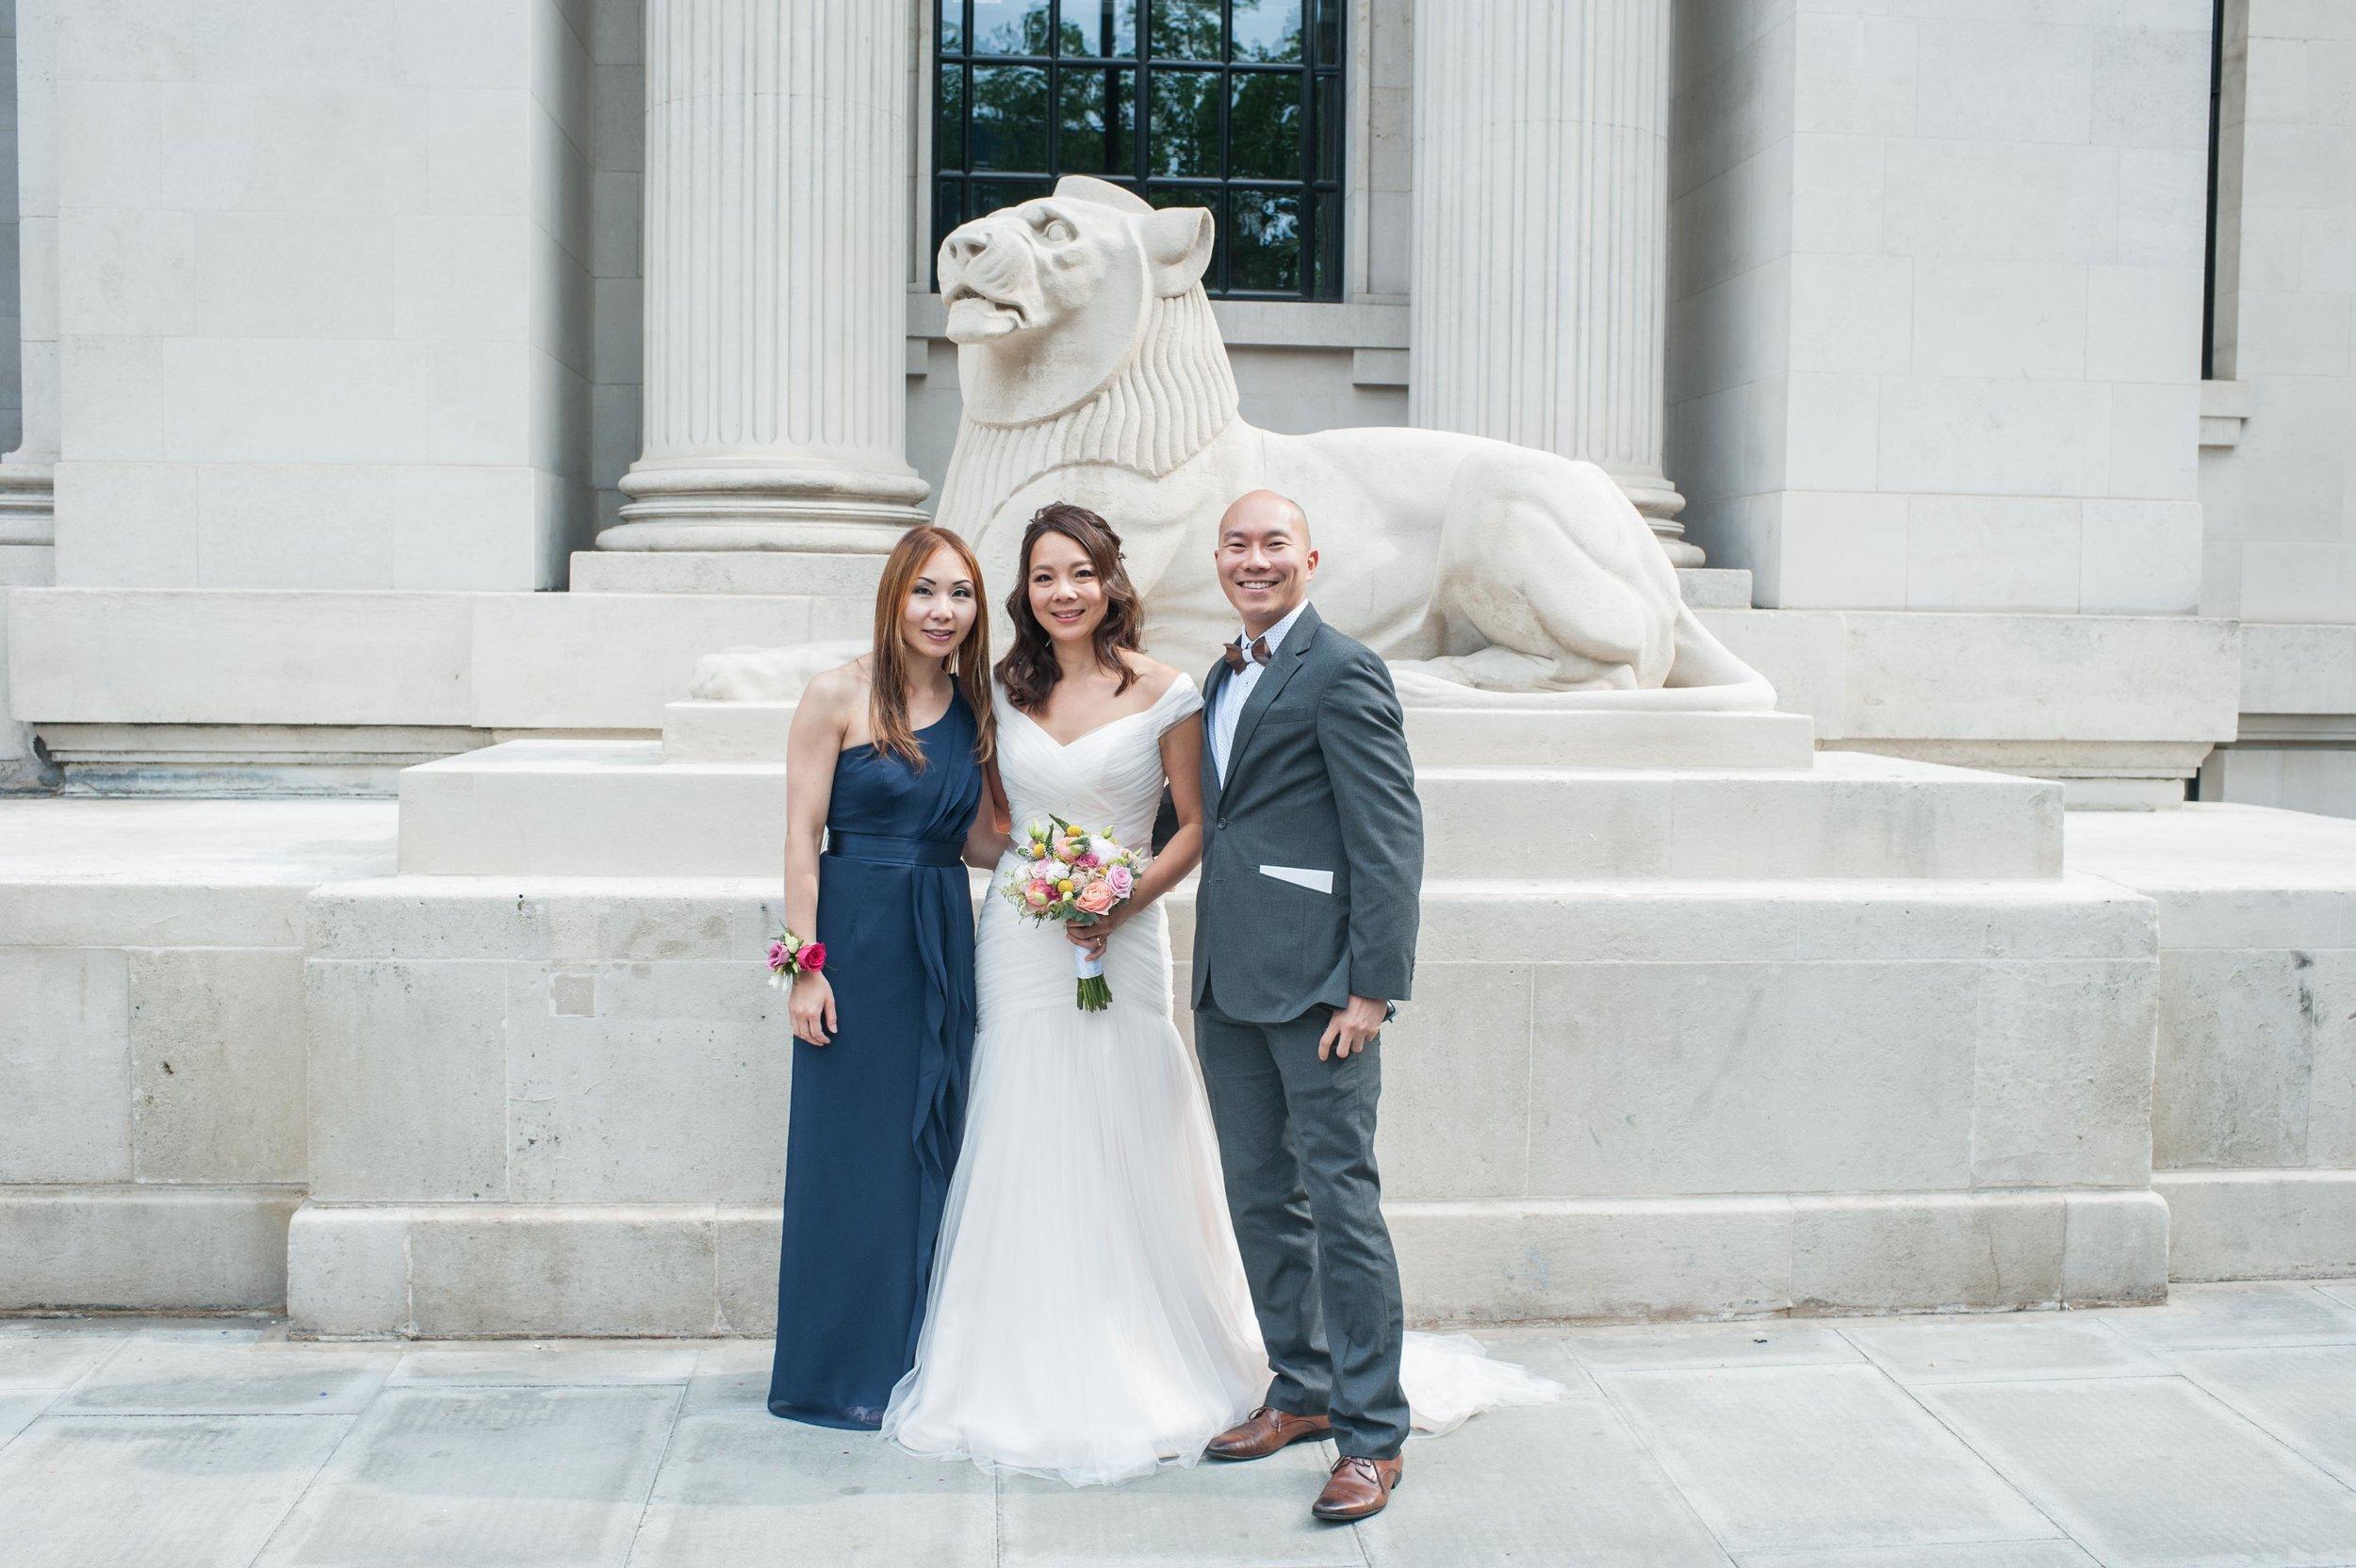 D&M_Marylebone Town Hall Wedding (134 of 239).jpg